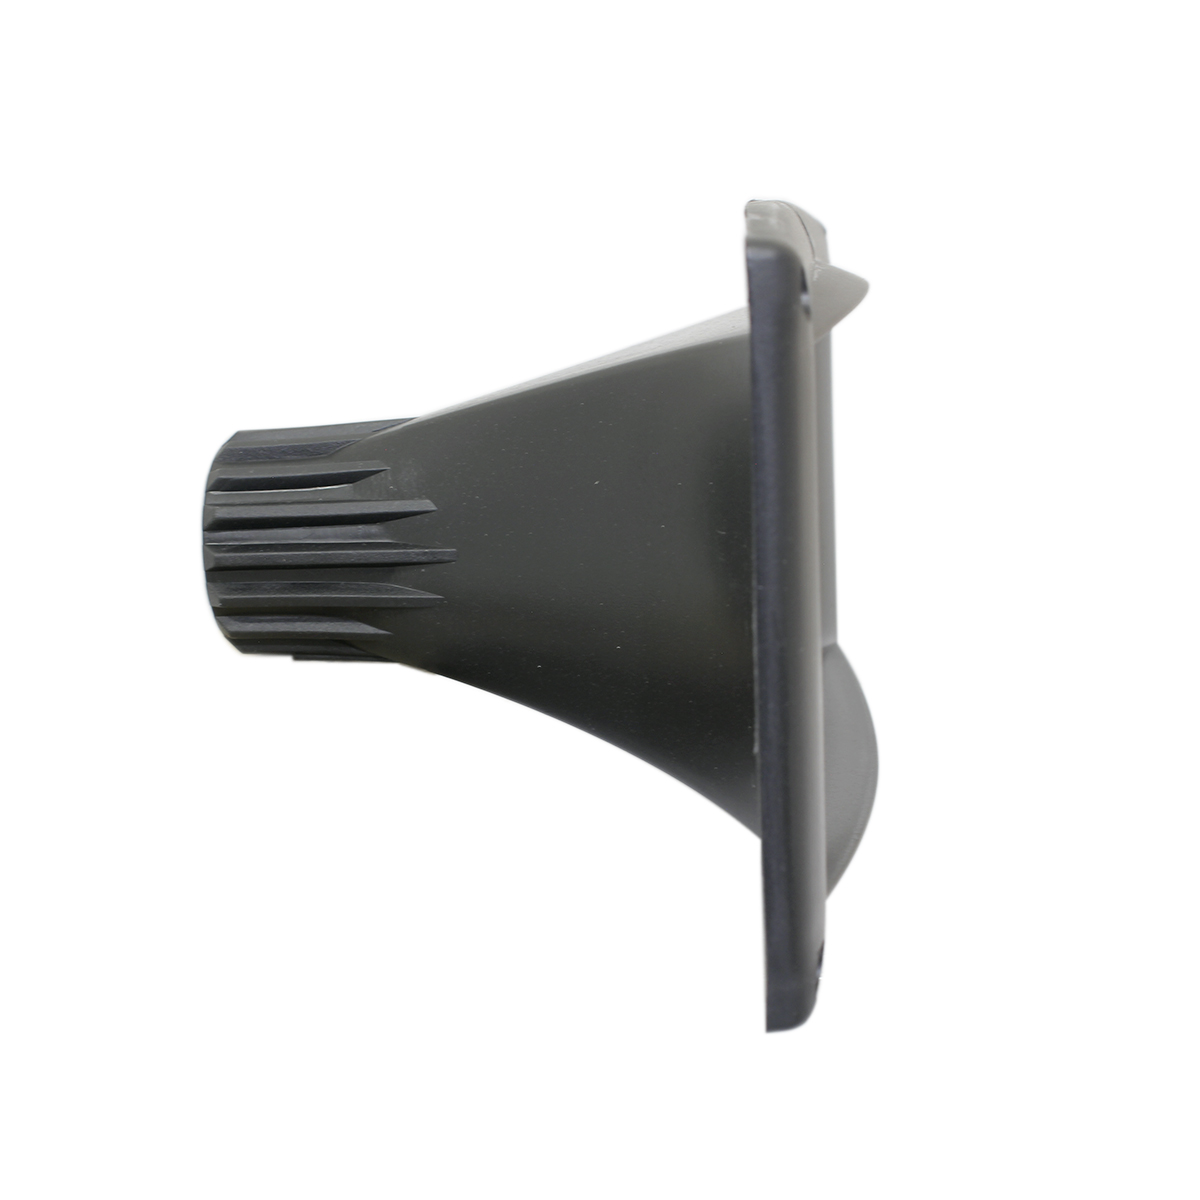 Corneta Plástico 25,5x12,5x13,5 LC2325 Ludovico 16015